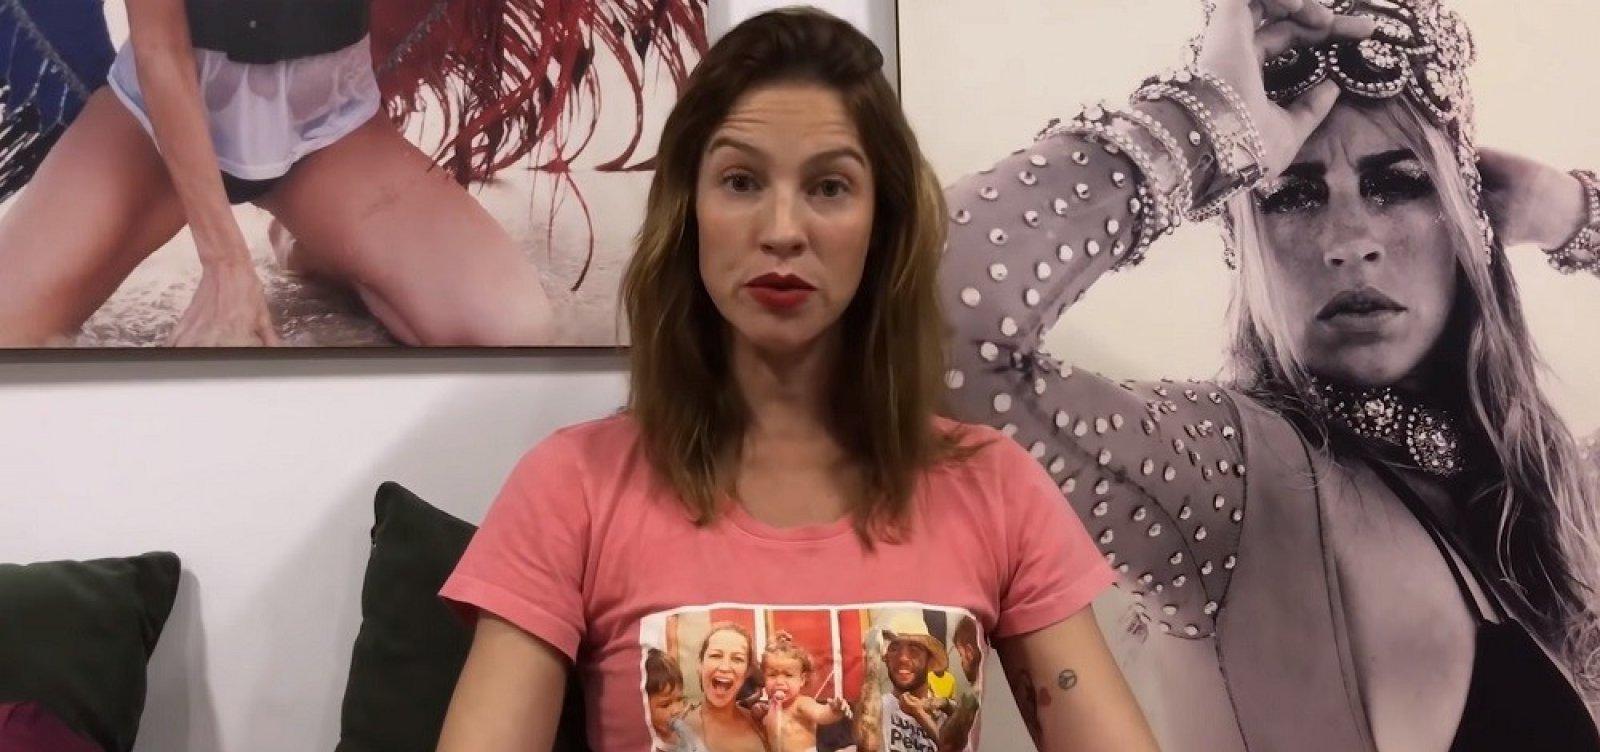 Luana Piovani estrelará reality sobre temas tabu: 'A verdade já está no meu pacote'